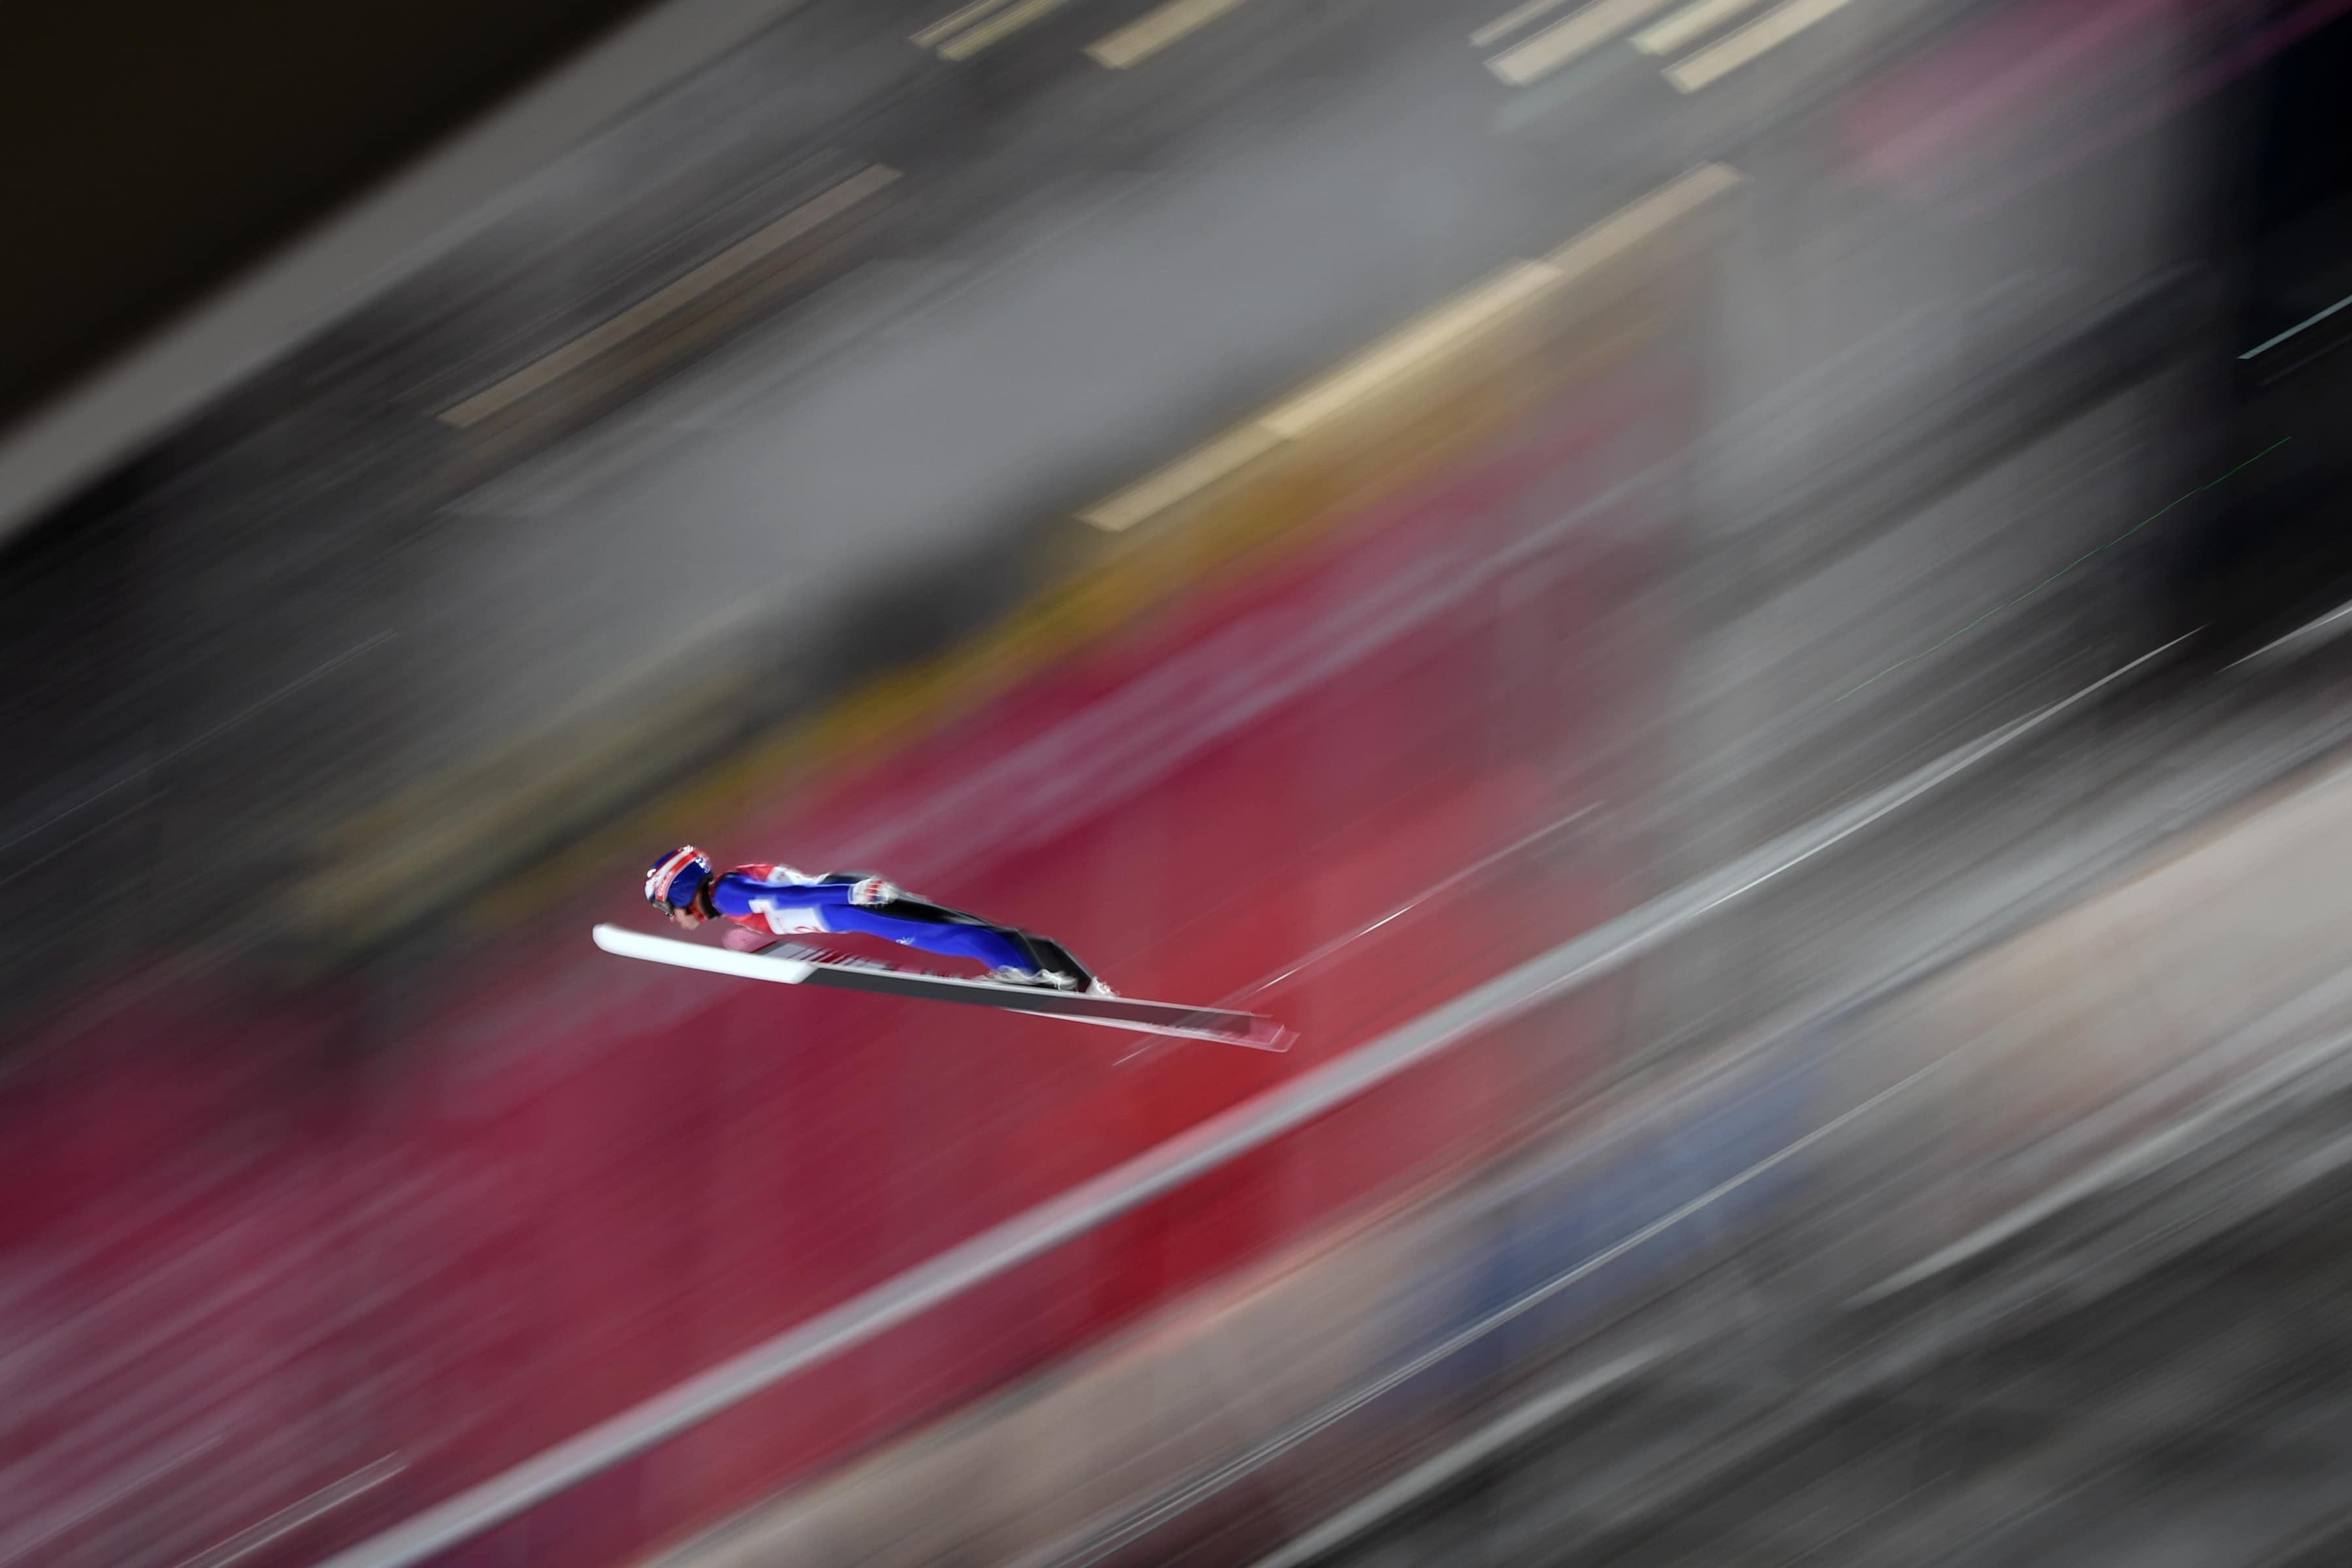 Olimpiadi invernali PyeongChang foto primo giorno